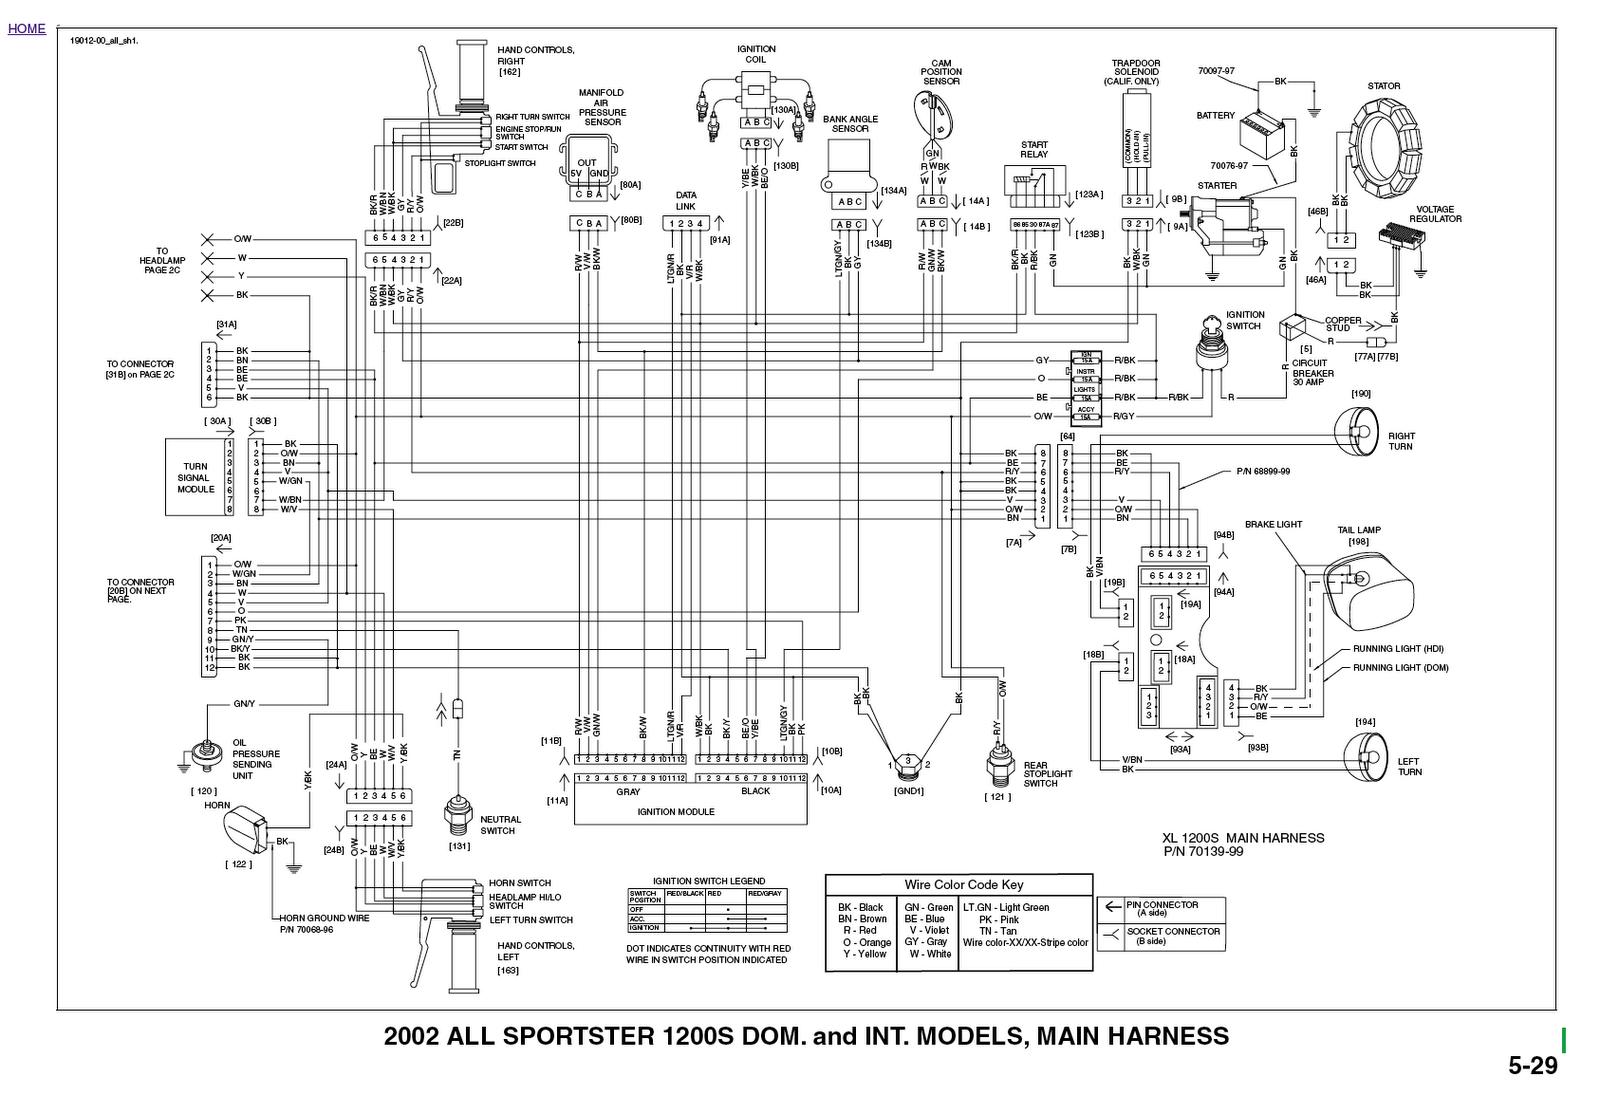 New Biltwell Blog: Shazam, Diagram!